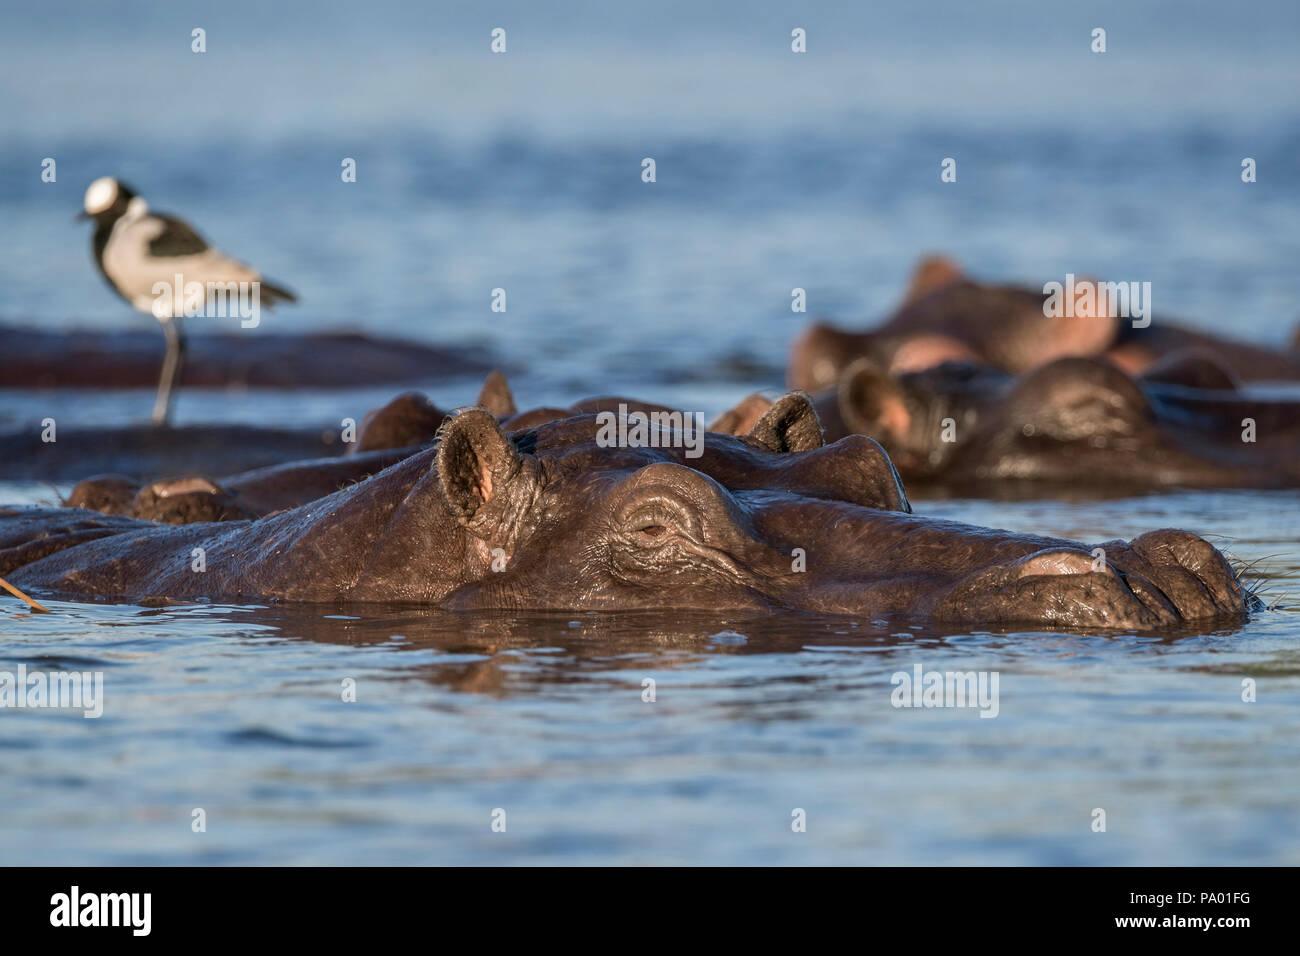 Hippos (Hippopotamus amphibius), Chobe river, Botswana - Stock Image